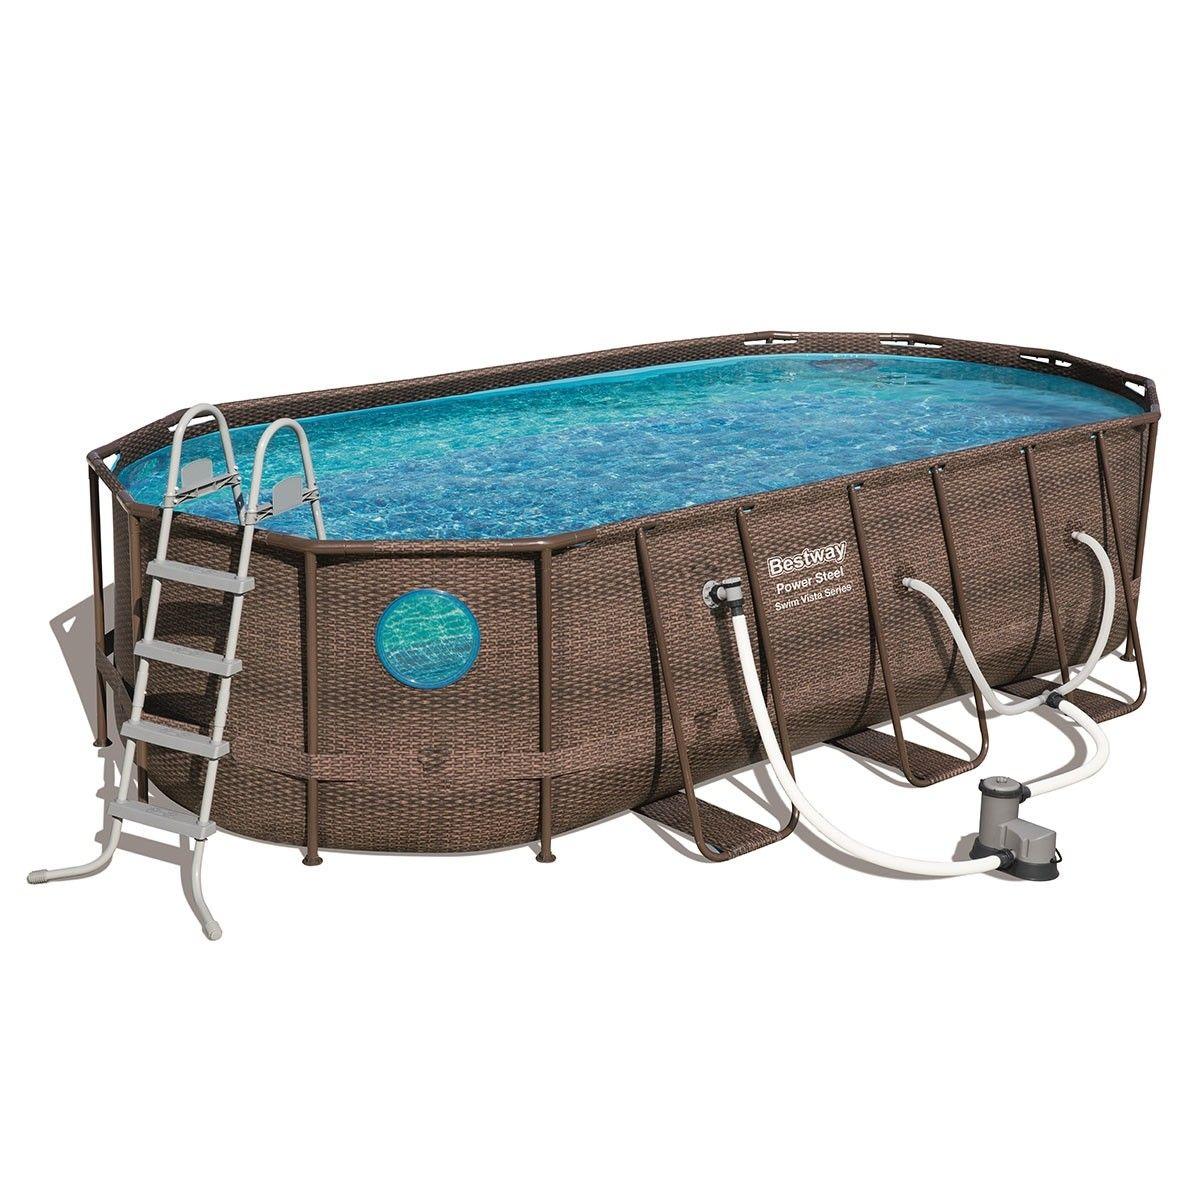 Bestway Steel Frame Above Ground Swimming Pool Filter Pump 5.49 x 2.74 x  1.22M